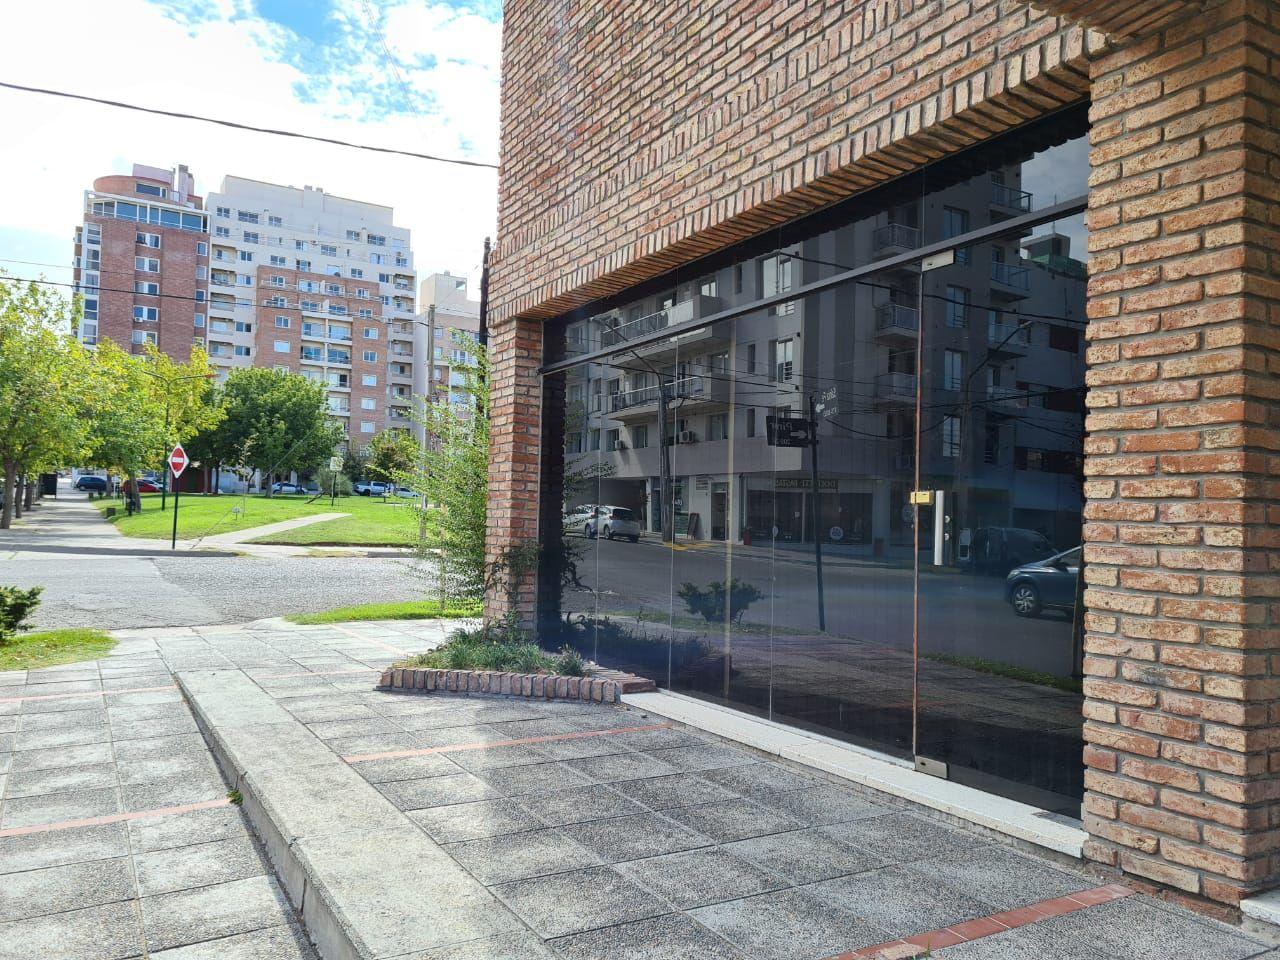 Oficina en alquiler ubicado en Área Centro Este